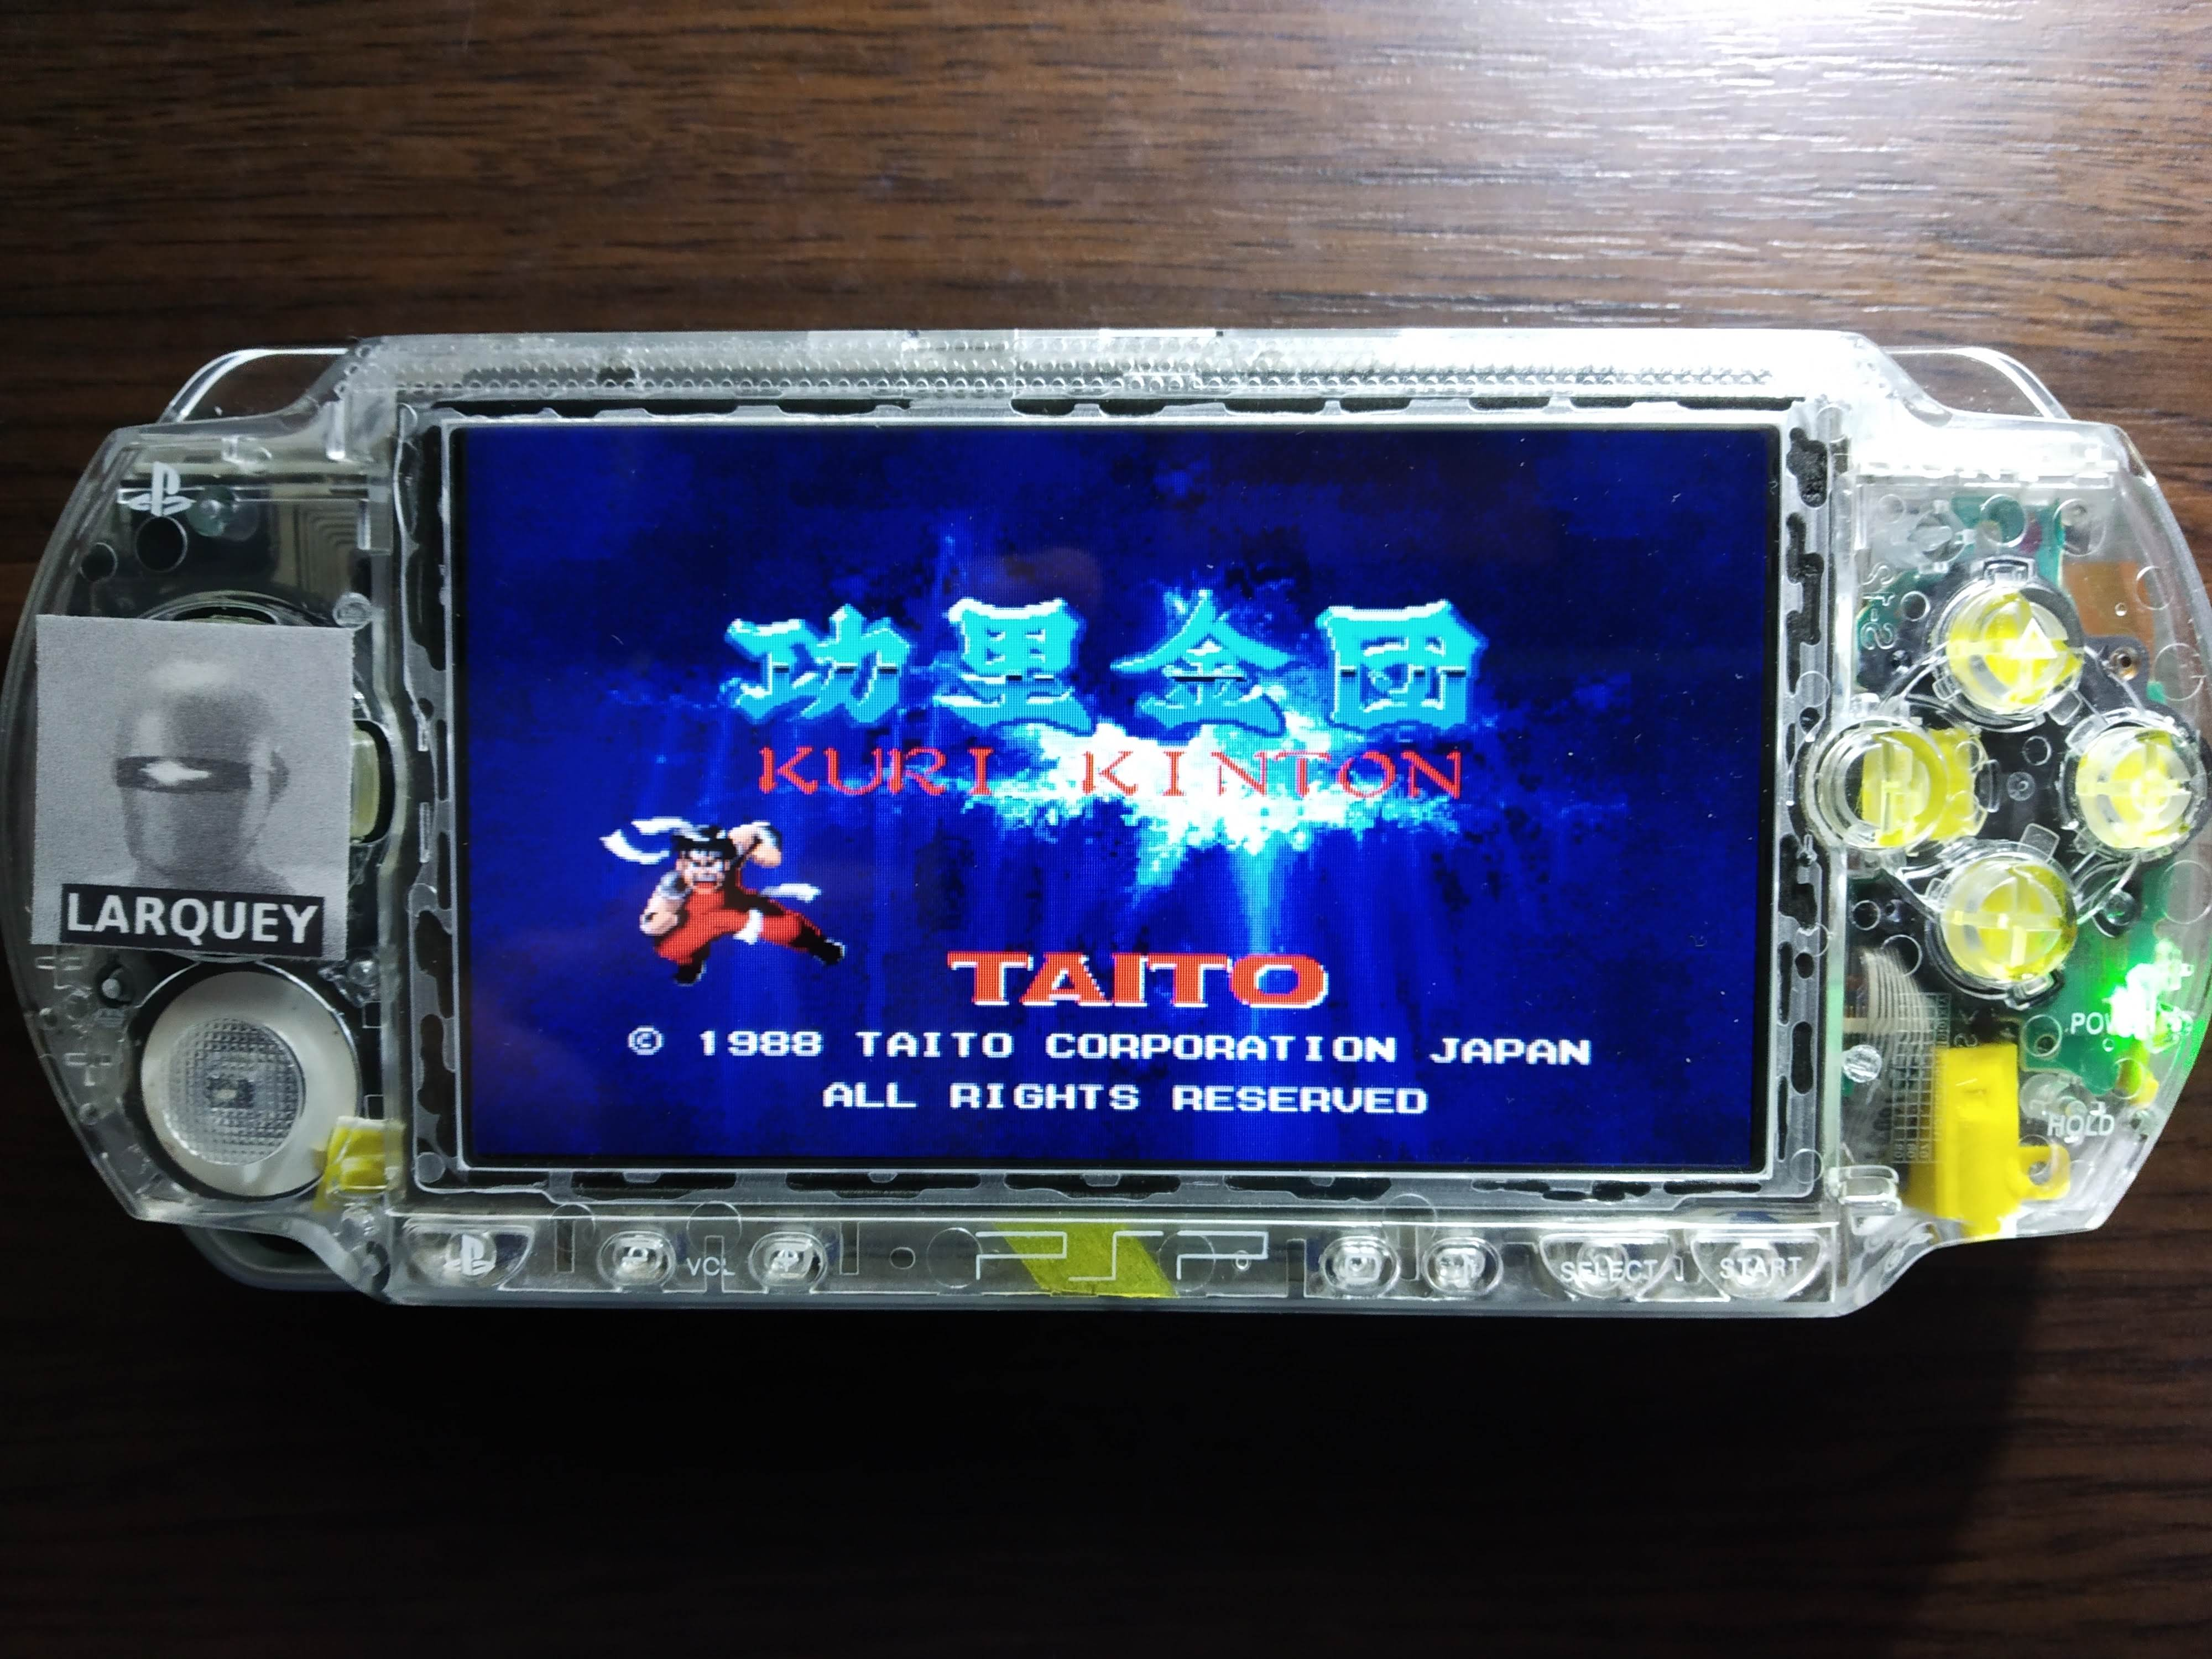 Larquey: Taito Legends: Power-Up: Kuri Kinton (PSP) 18,800 points on 2019-12-15 09:15:14